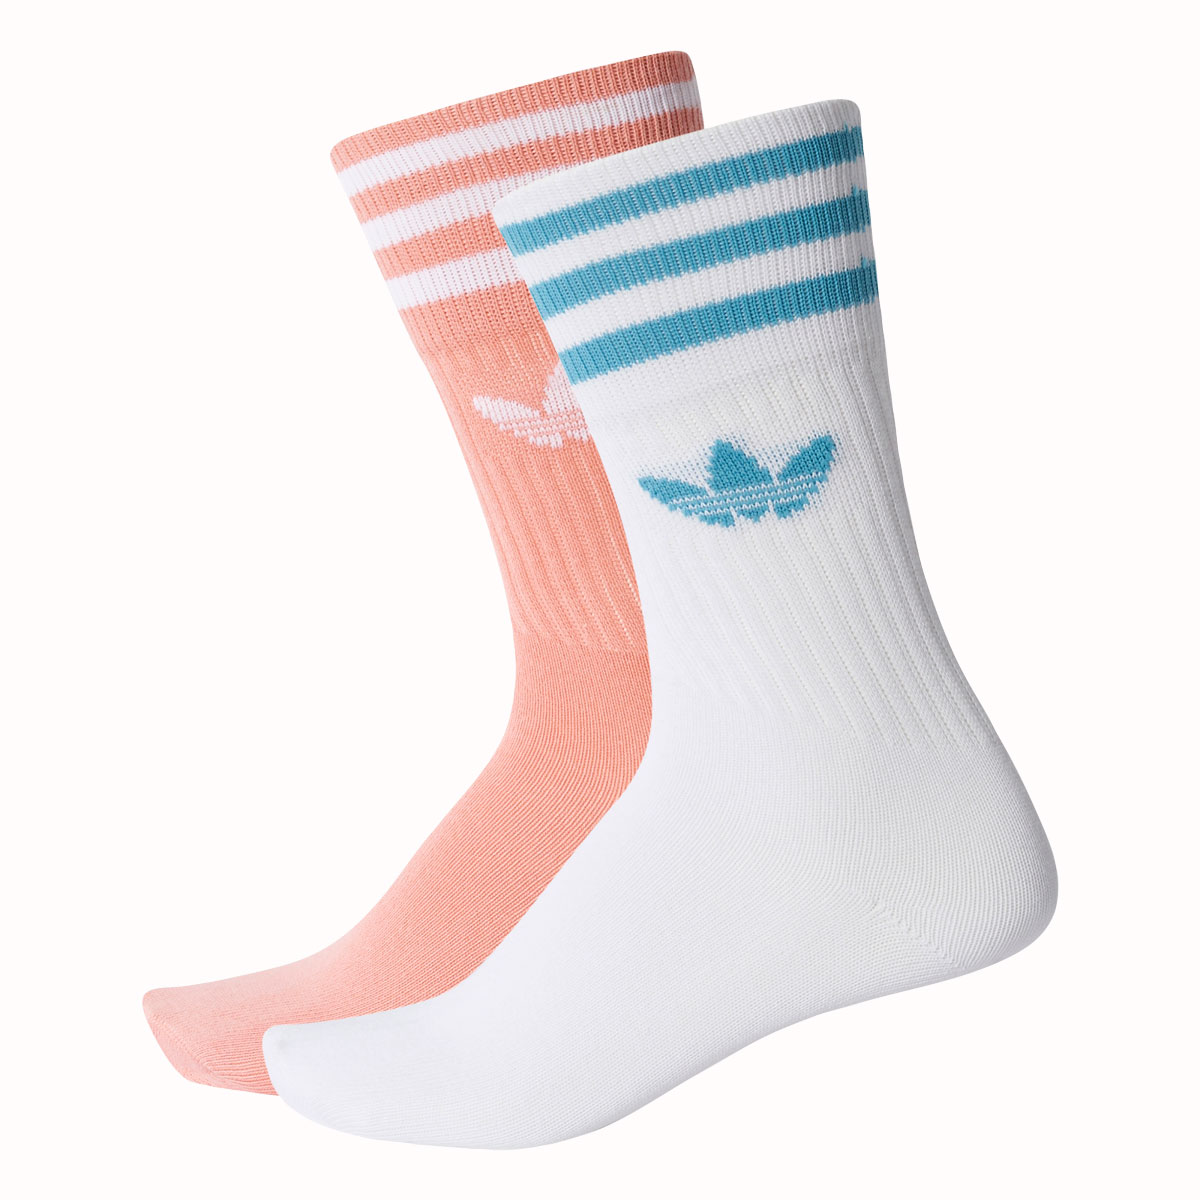 Atmos Pink Adidas Originals Solid Crew Socks 2p Adidas Originals